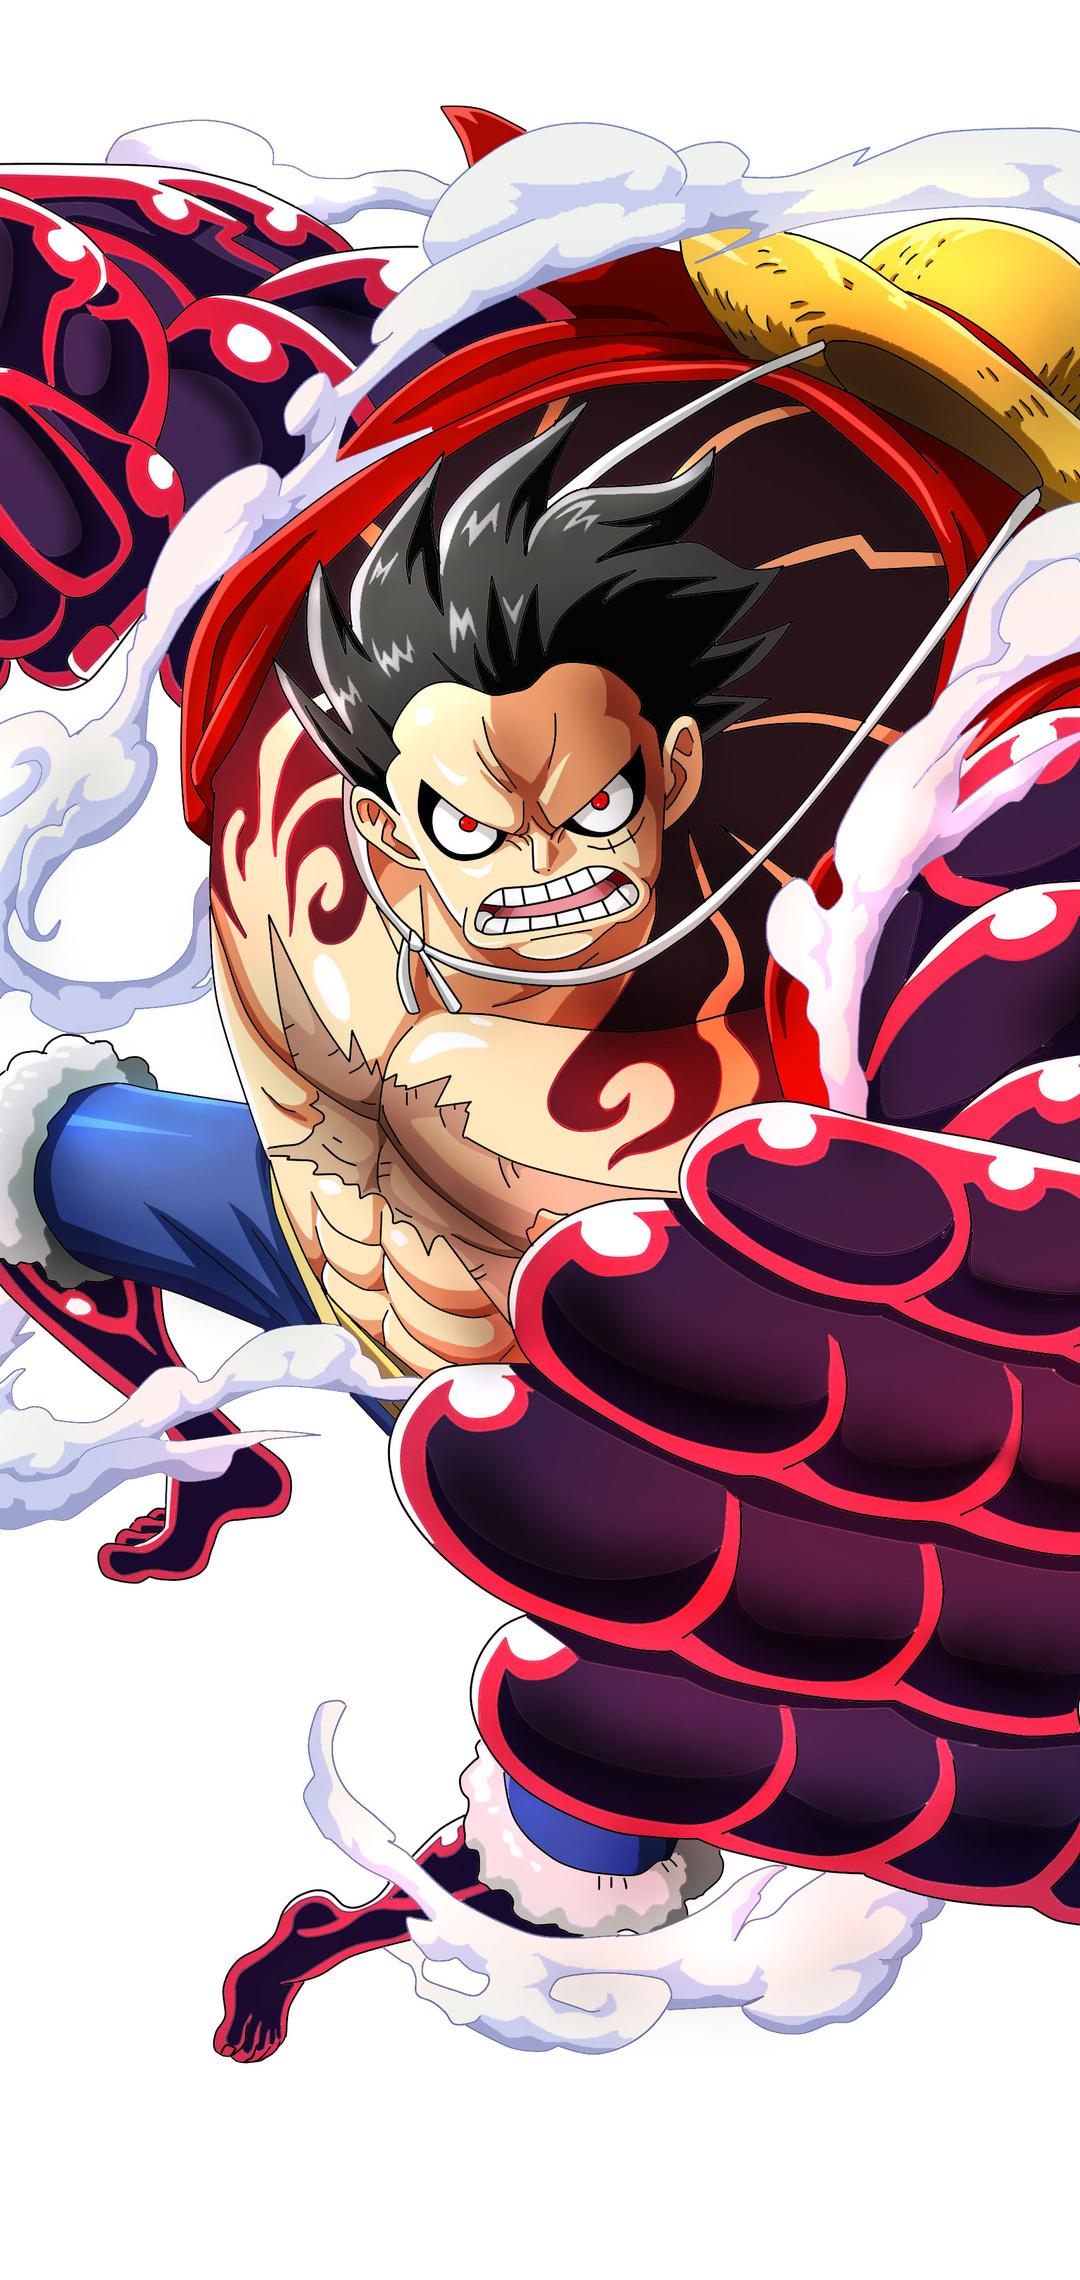 Unduh 5500 Koleksi Wallpaper Oppo Anime Hd Gratis